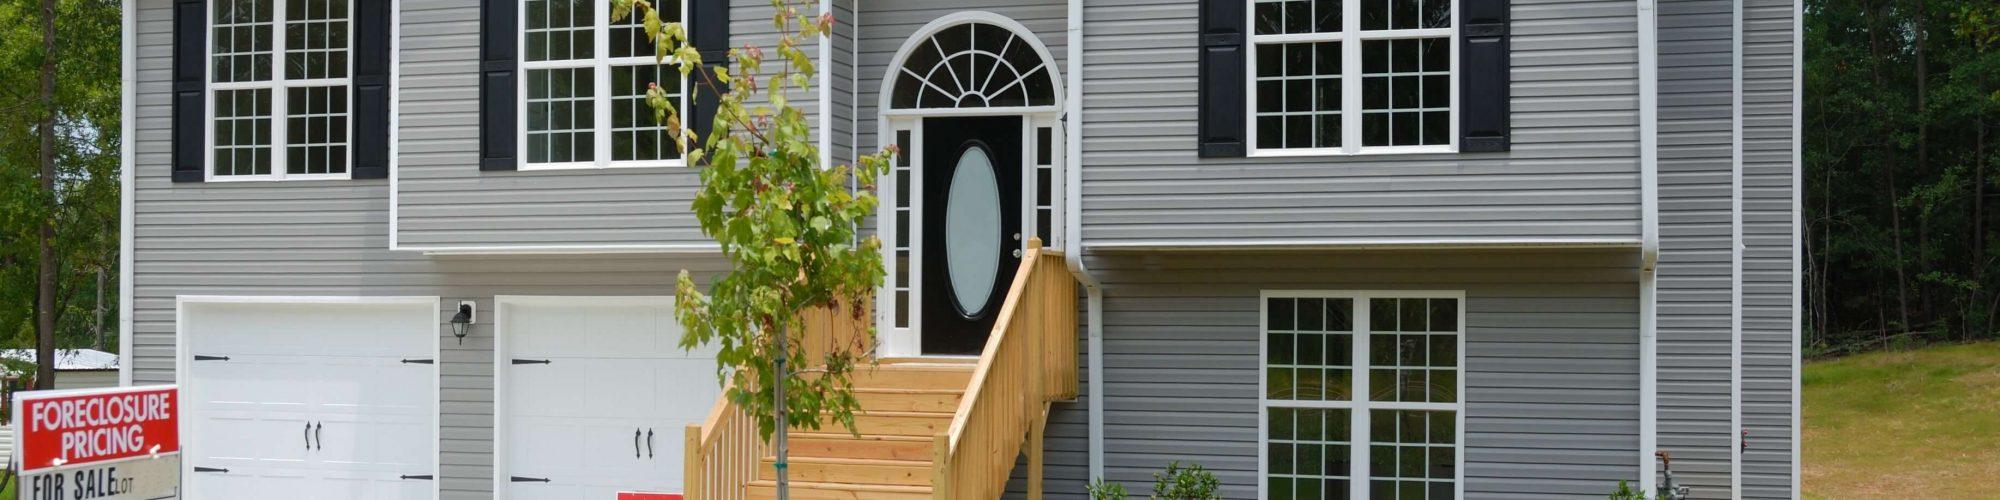 Home inspection checklist for inspectors | The JotForm Blog